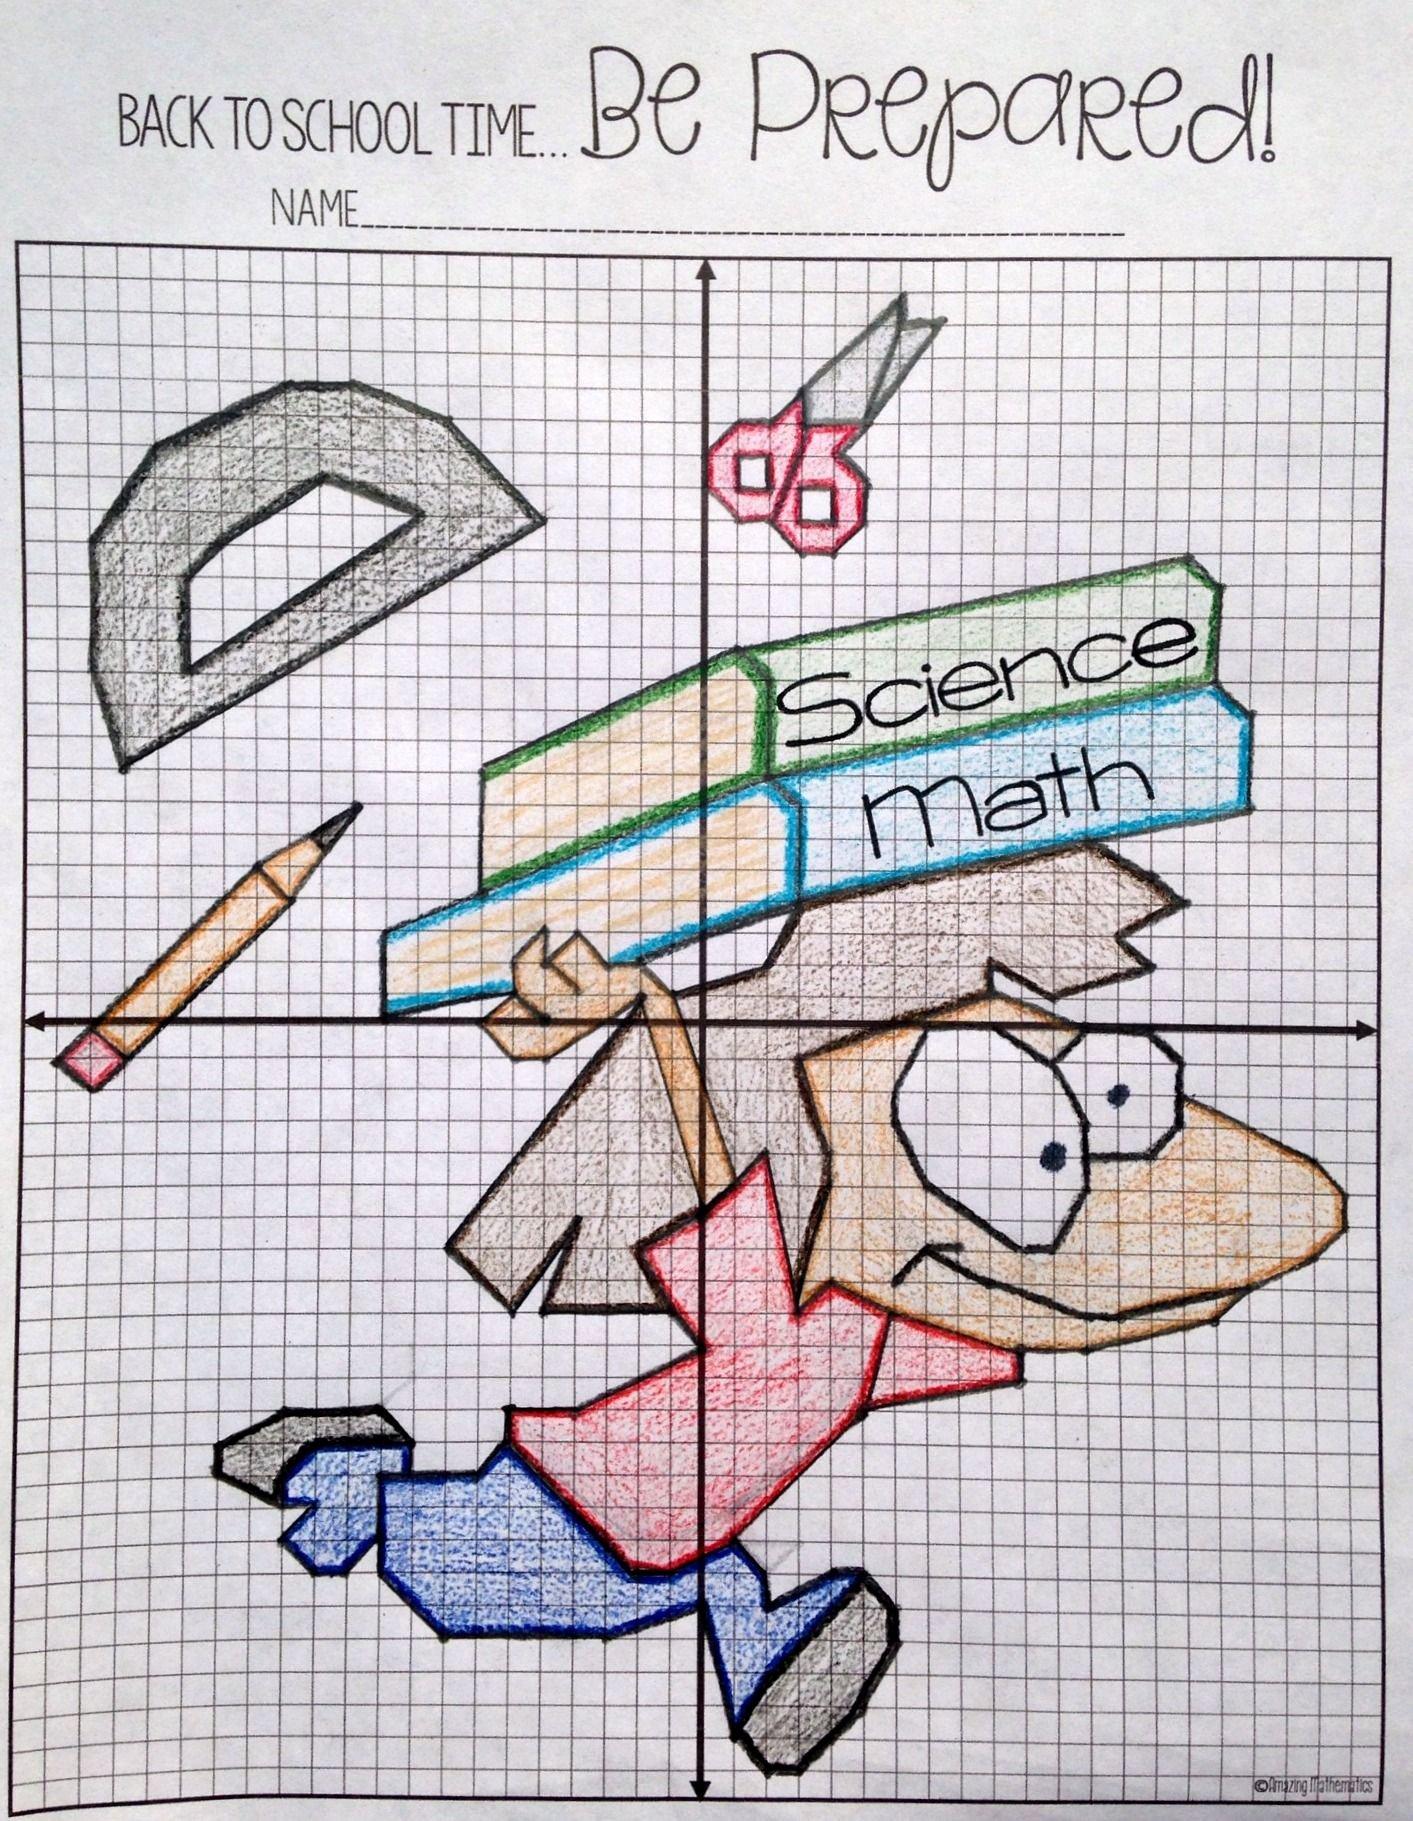 Plotting Points Worksheet Pdf Lovely Back to School Plotting Points Mystery Picture